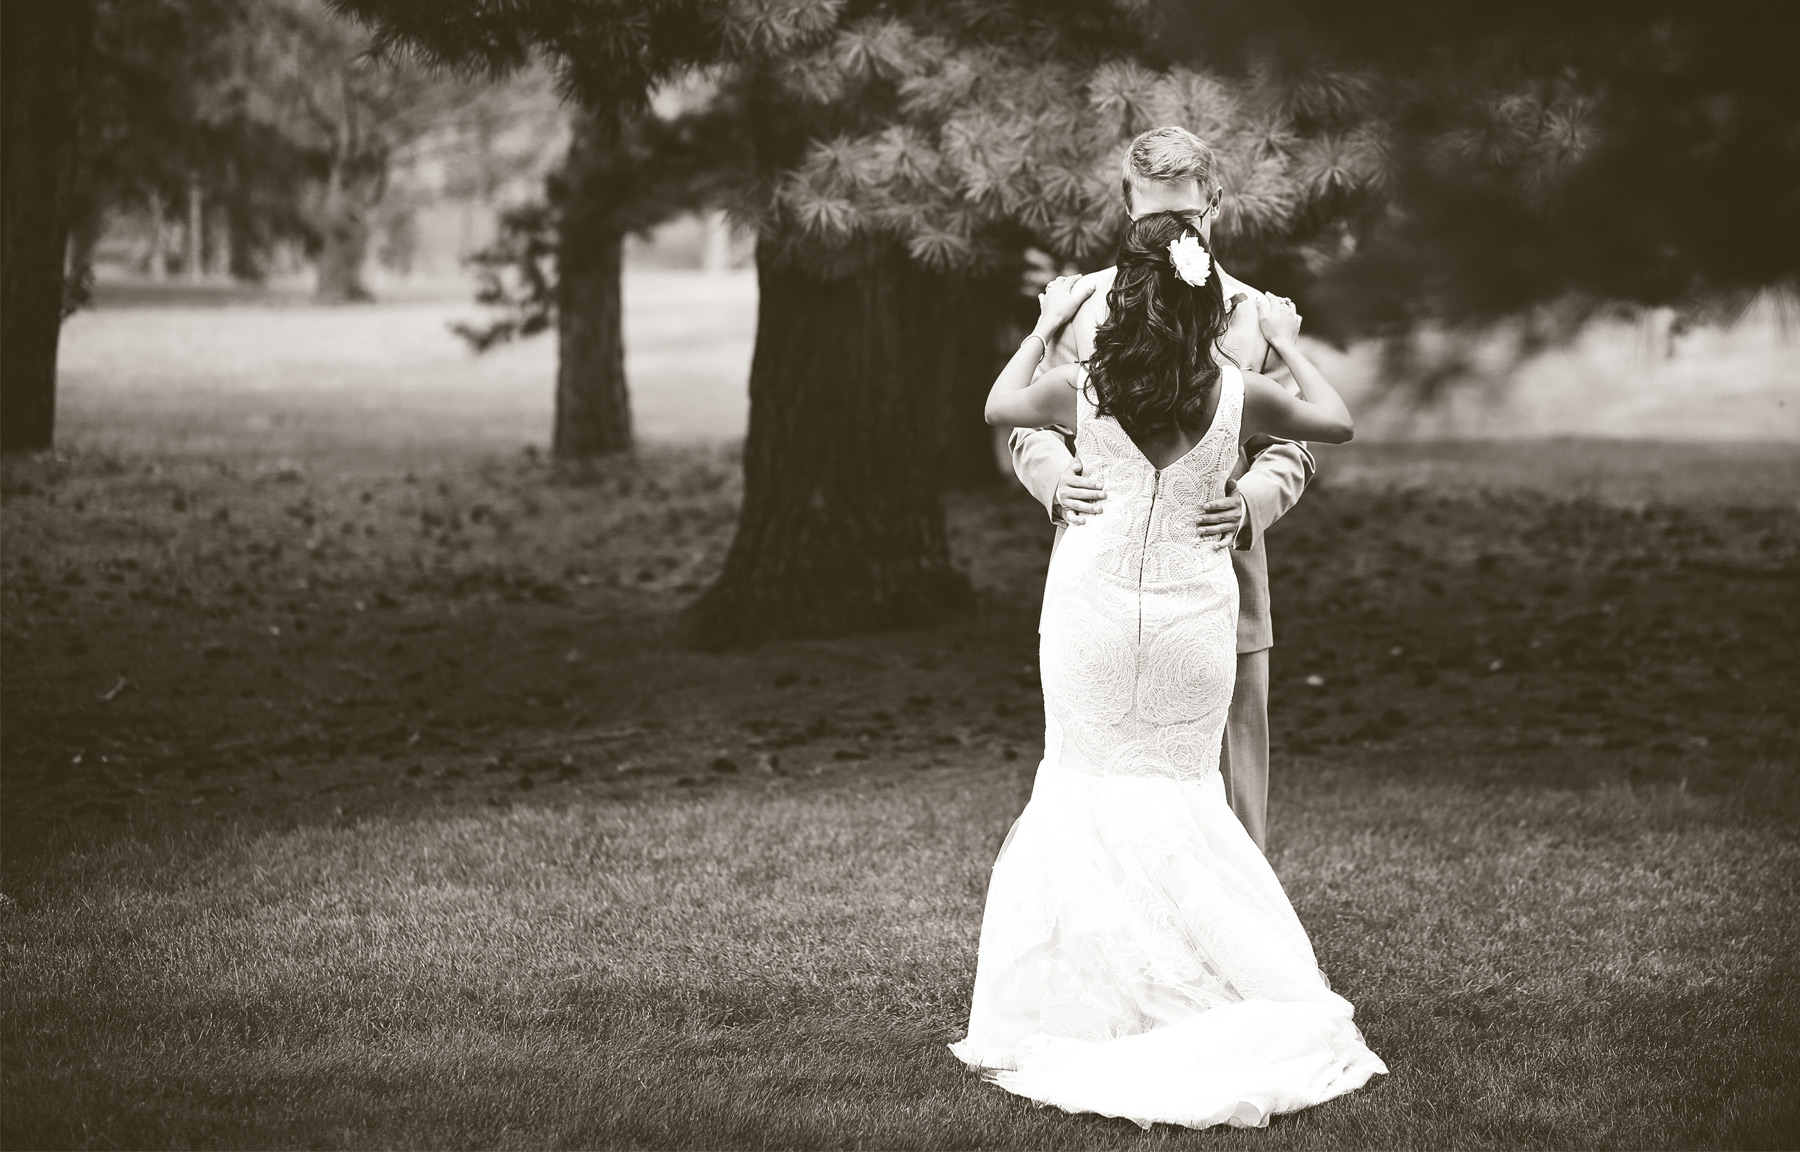 03-Minneapolis-Minnesota-Wedding-Photography-by-Vick-Photography-Garden-First-Look-Daphne-&-Austin.jpg